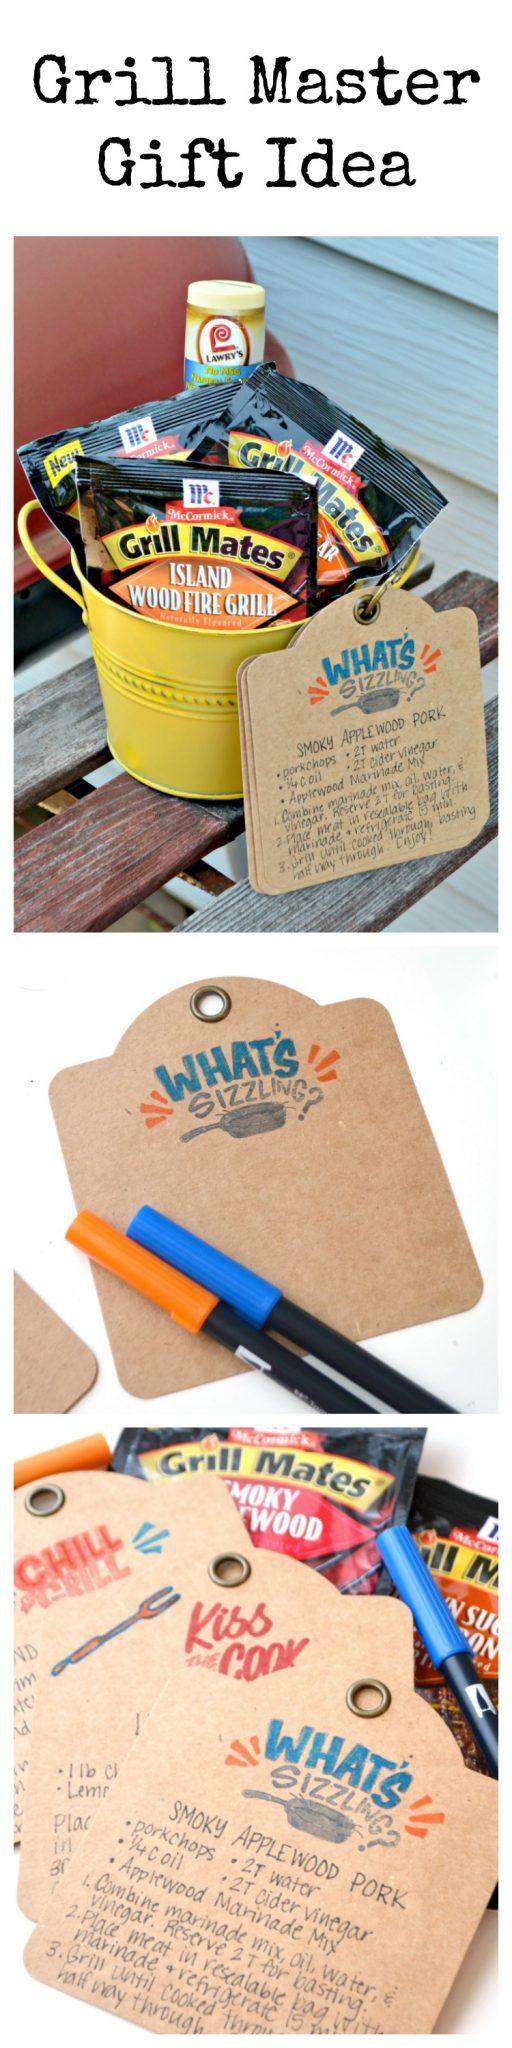 Grill Master Gift Idea